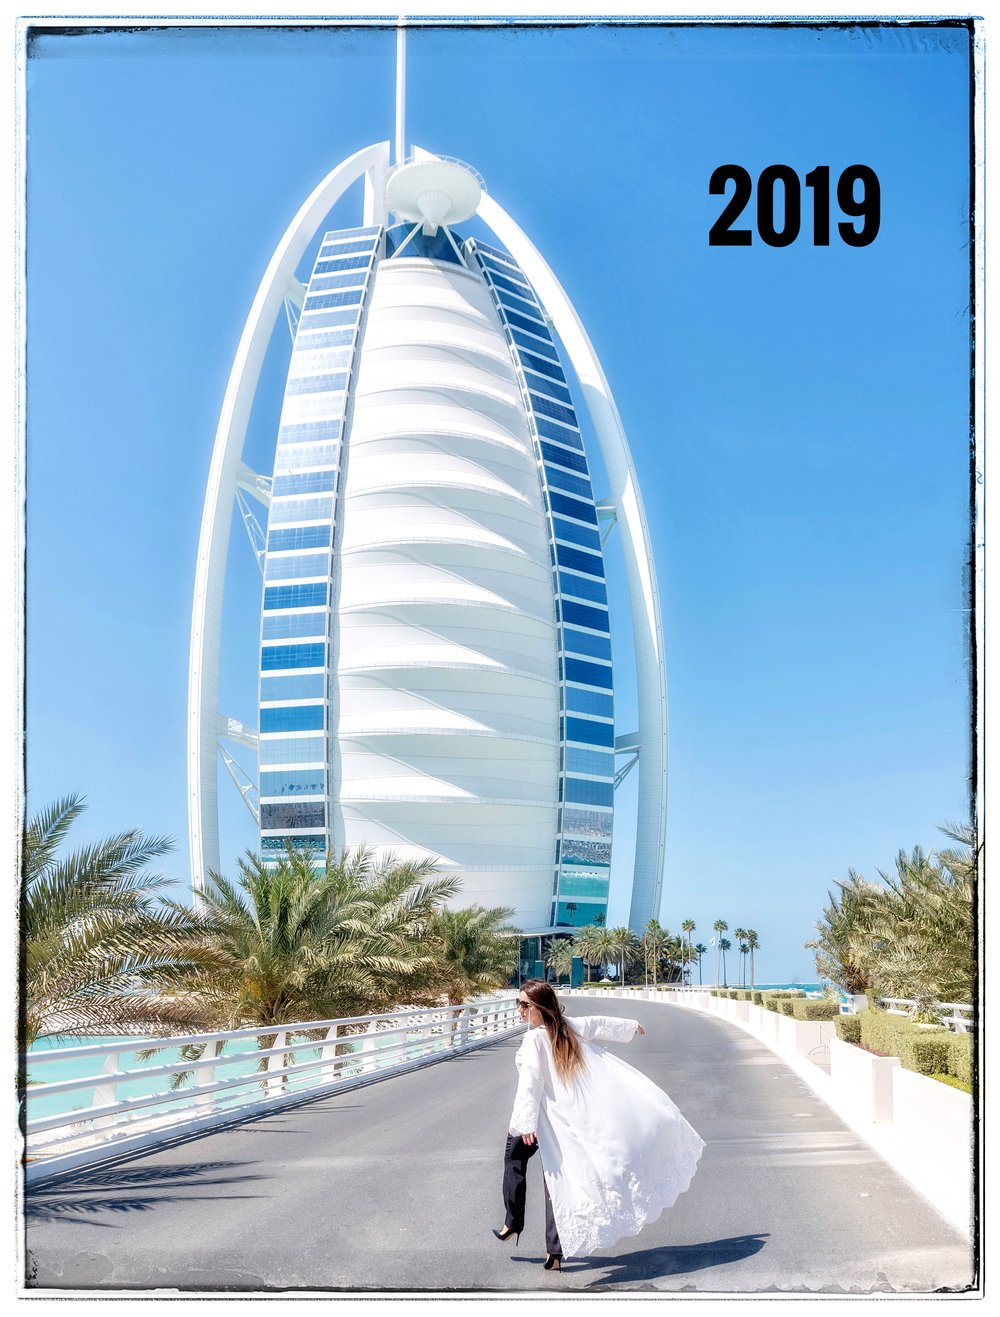 BURJ AL ARAB • DUBAI, UAE PHOTOGRAPHER: ABDULLA